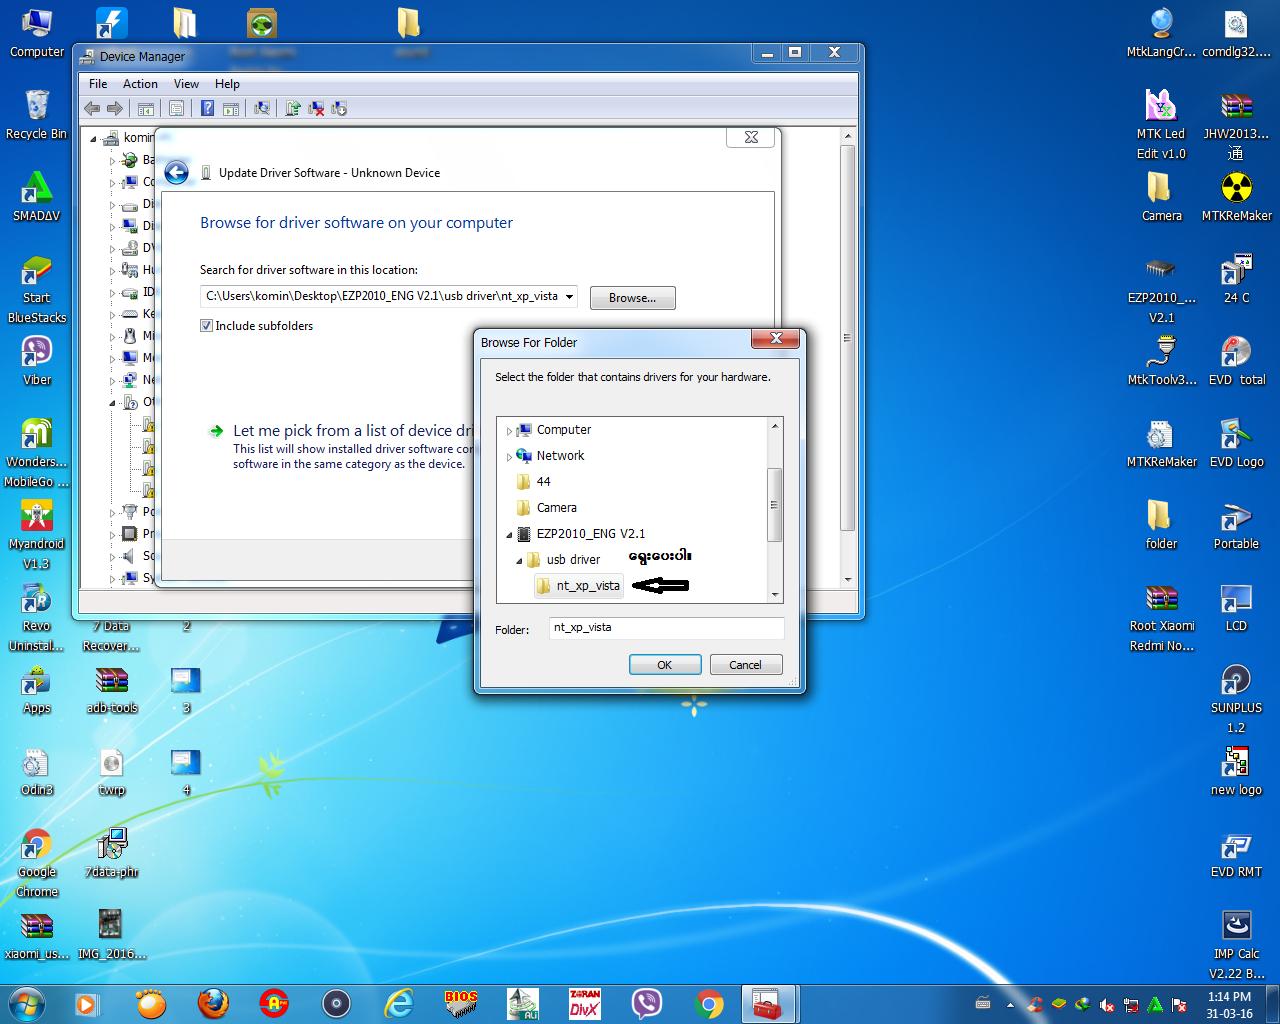 ezp2010 software download